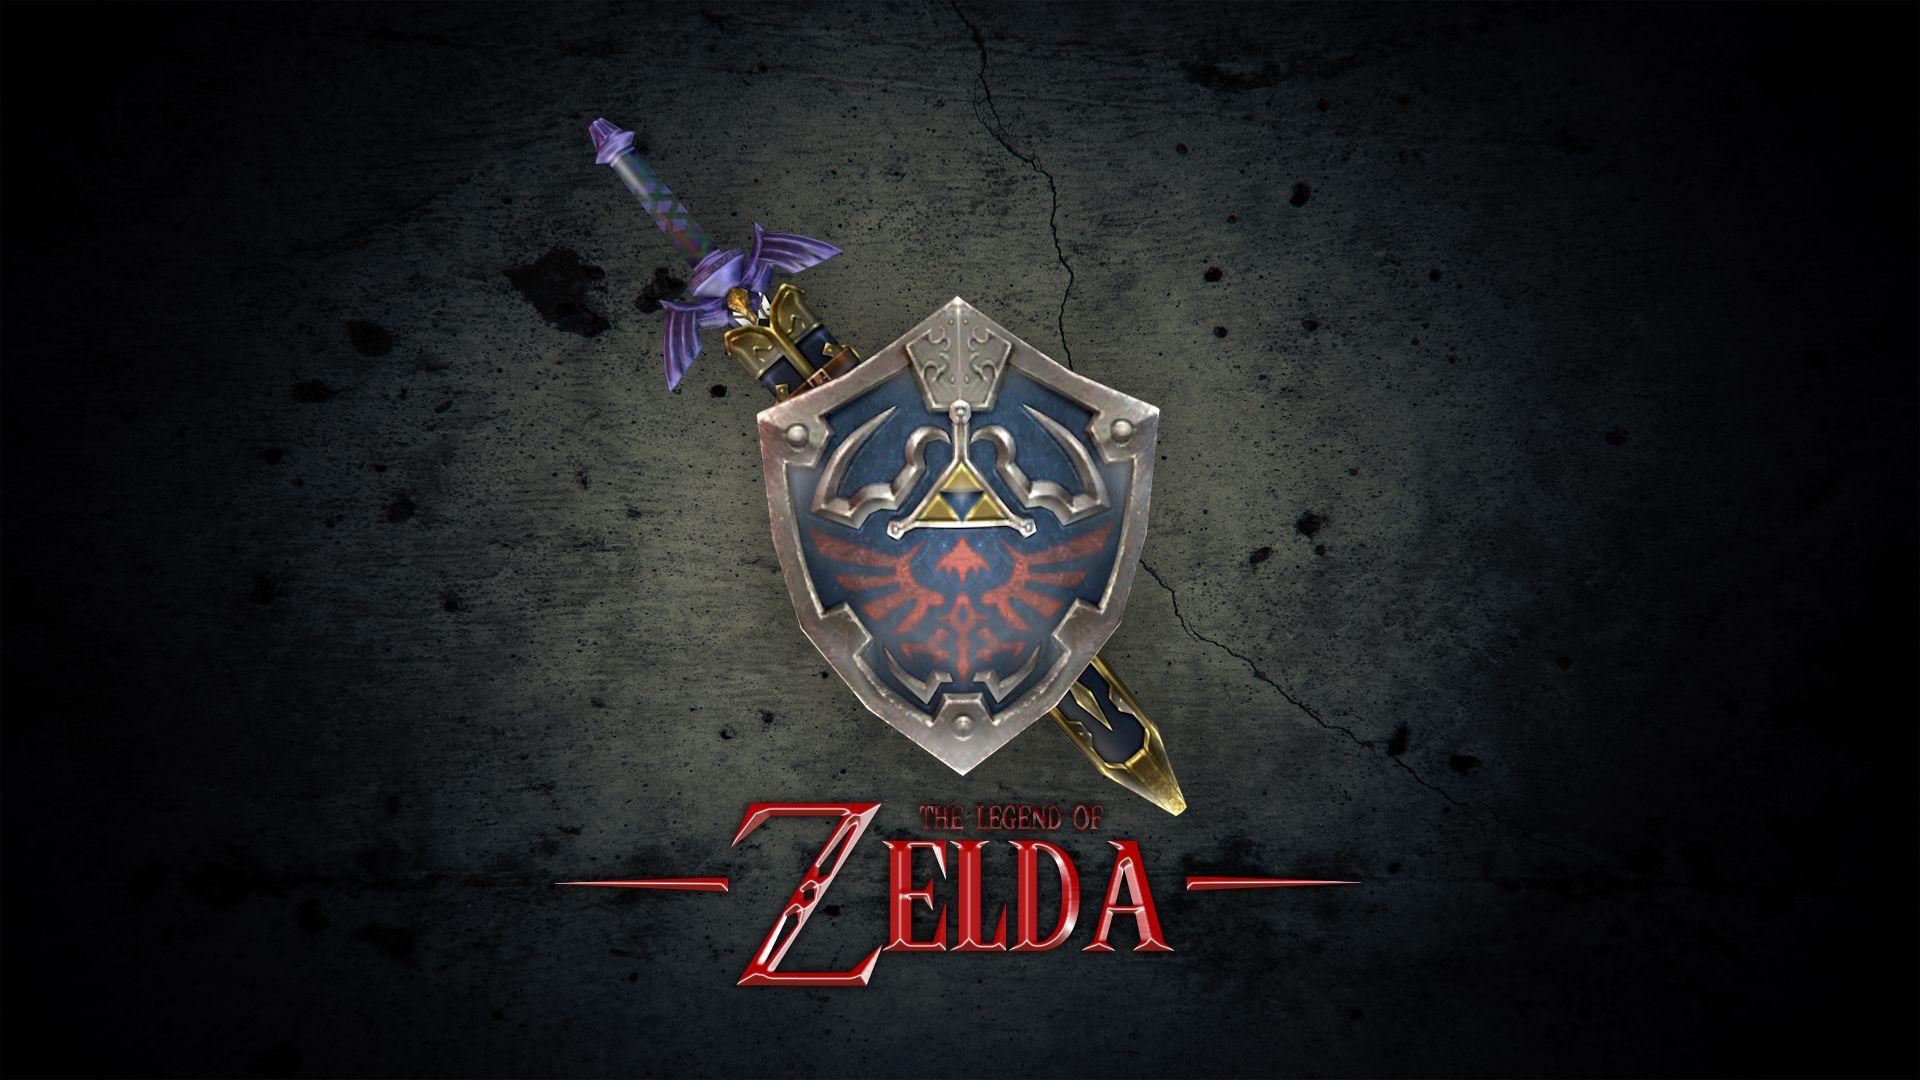 logo game zelda wallpaper